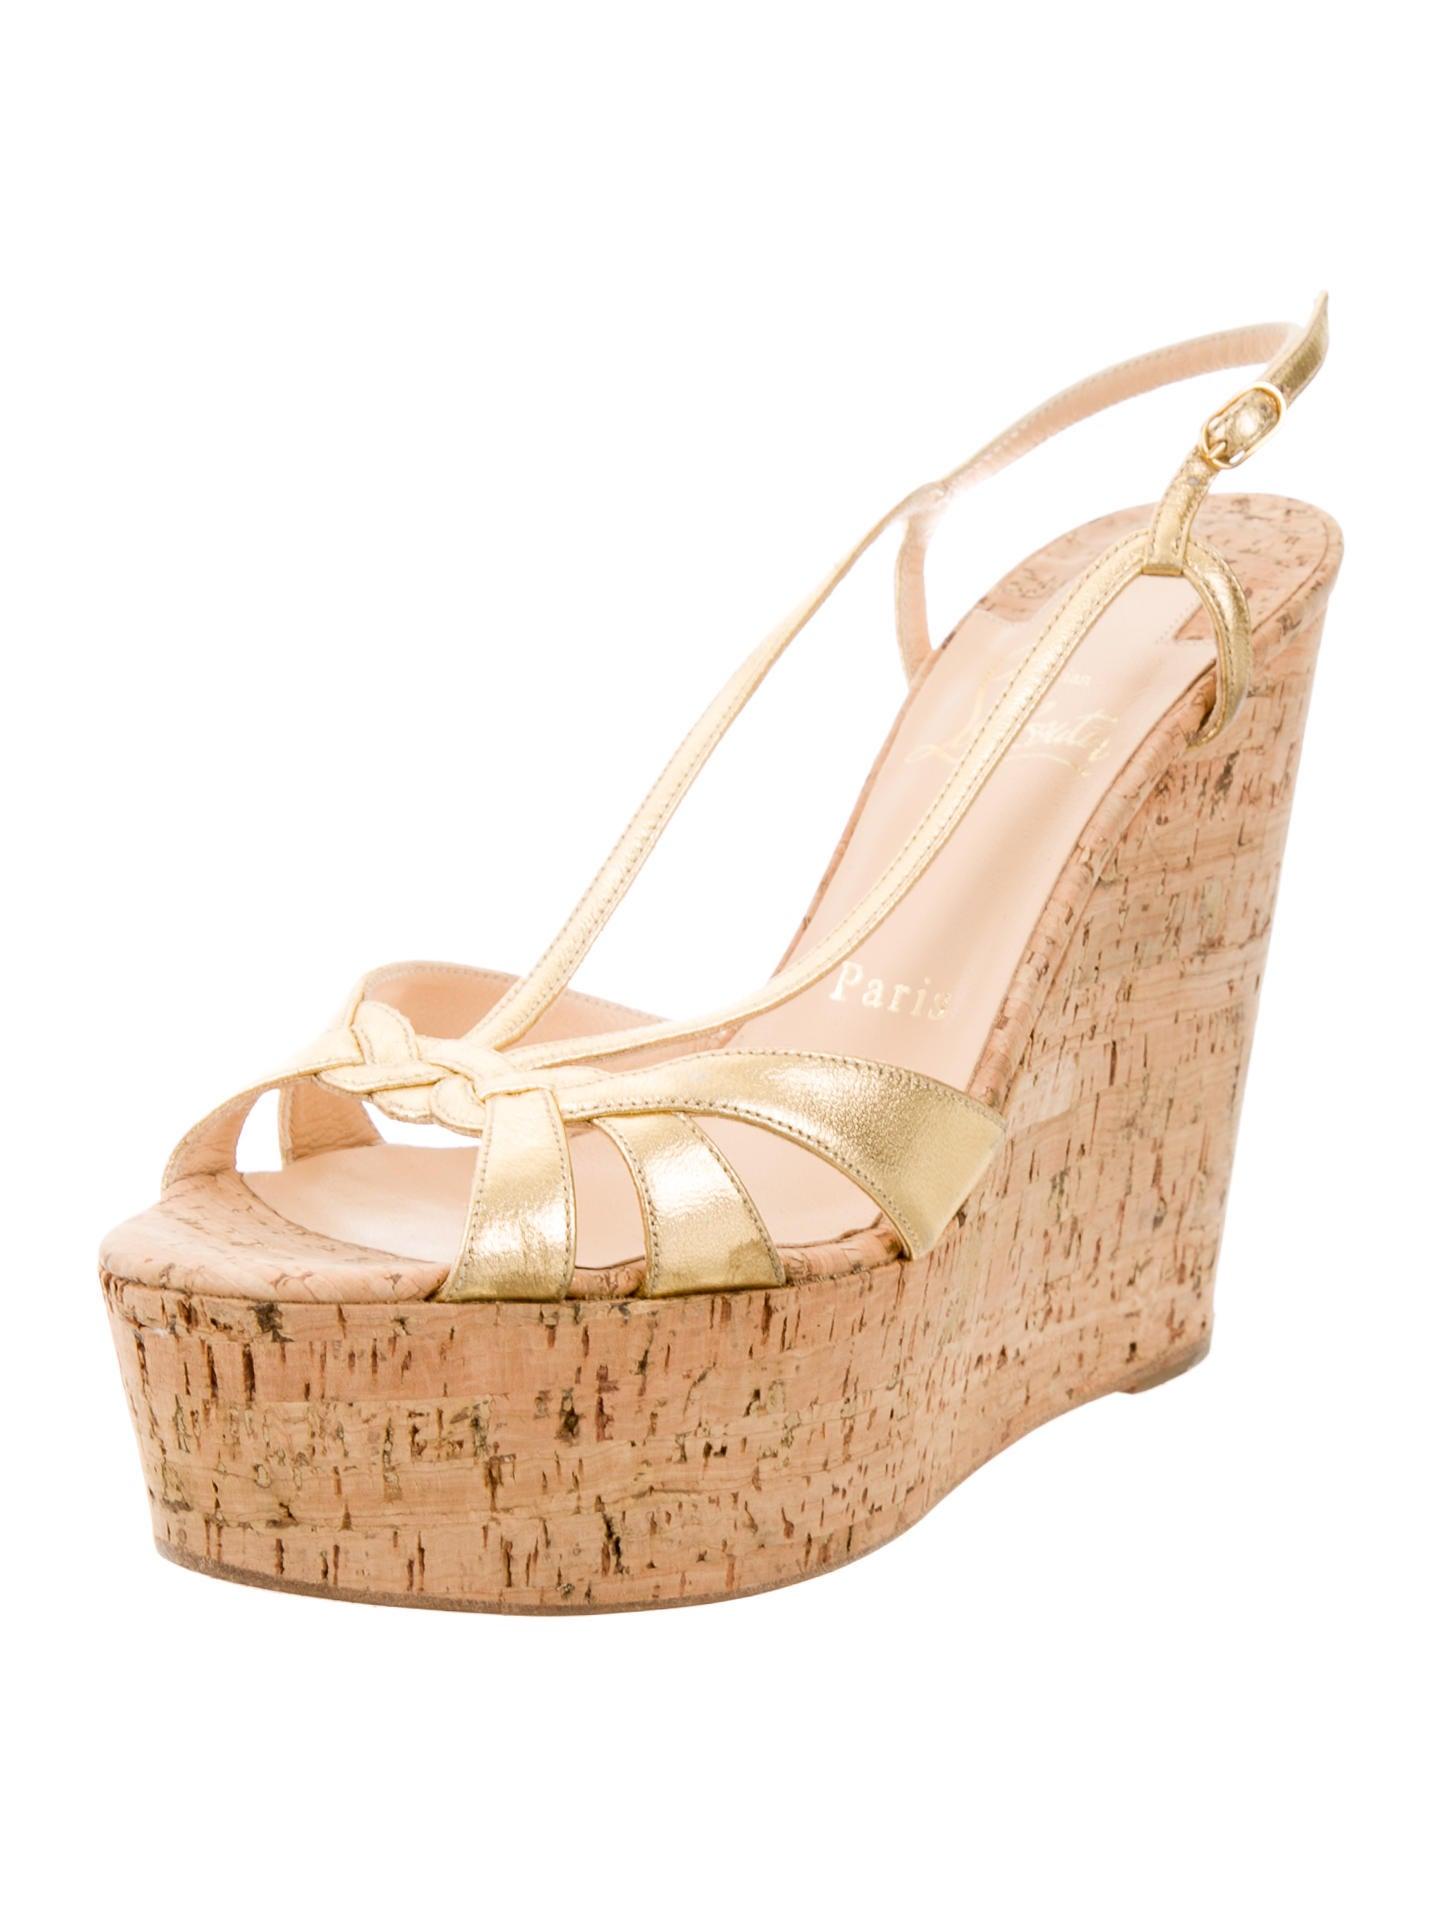 christian louboutin metallic wedge sandals shoes